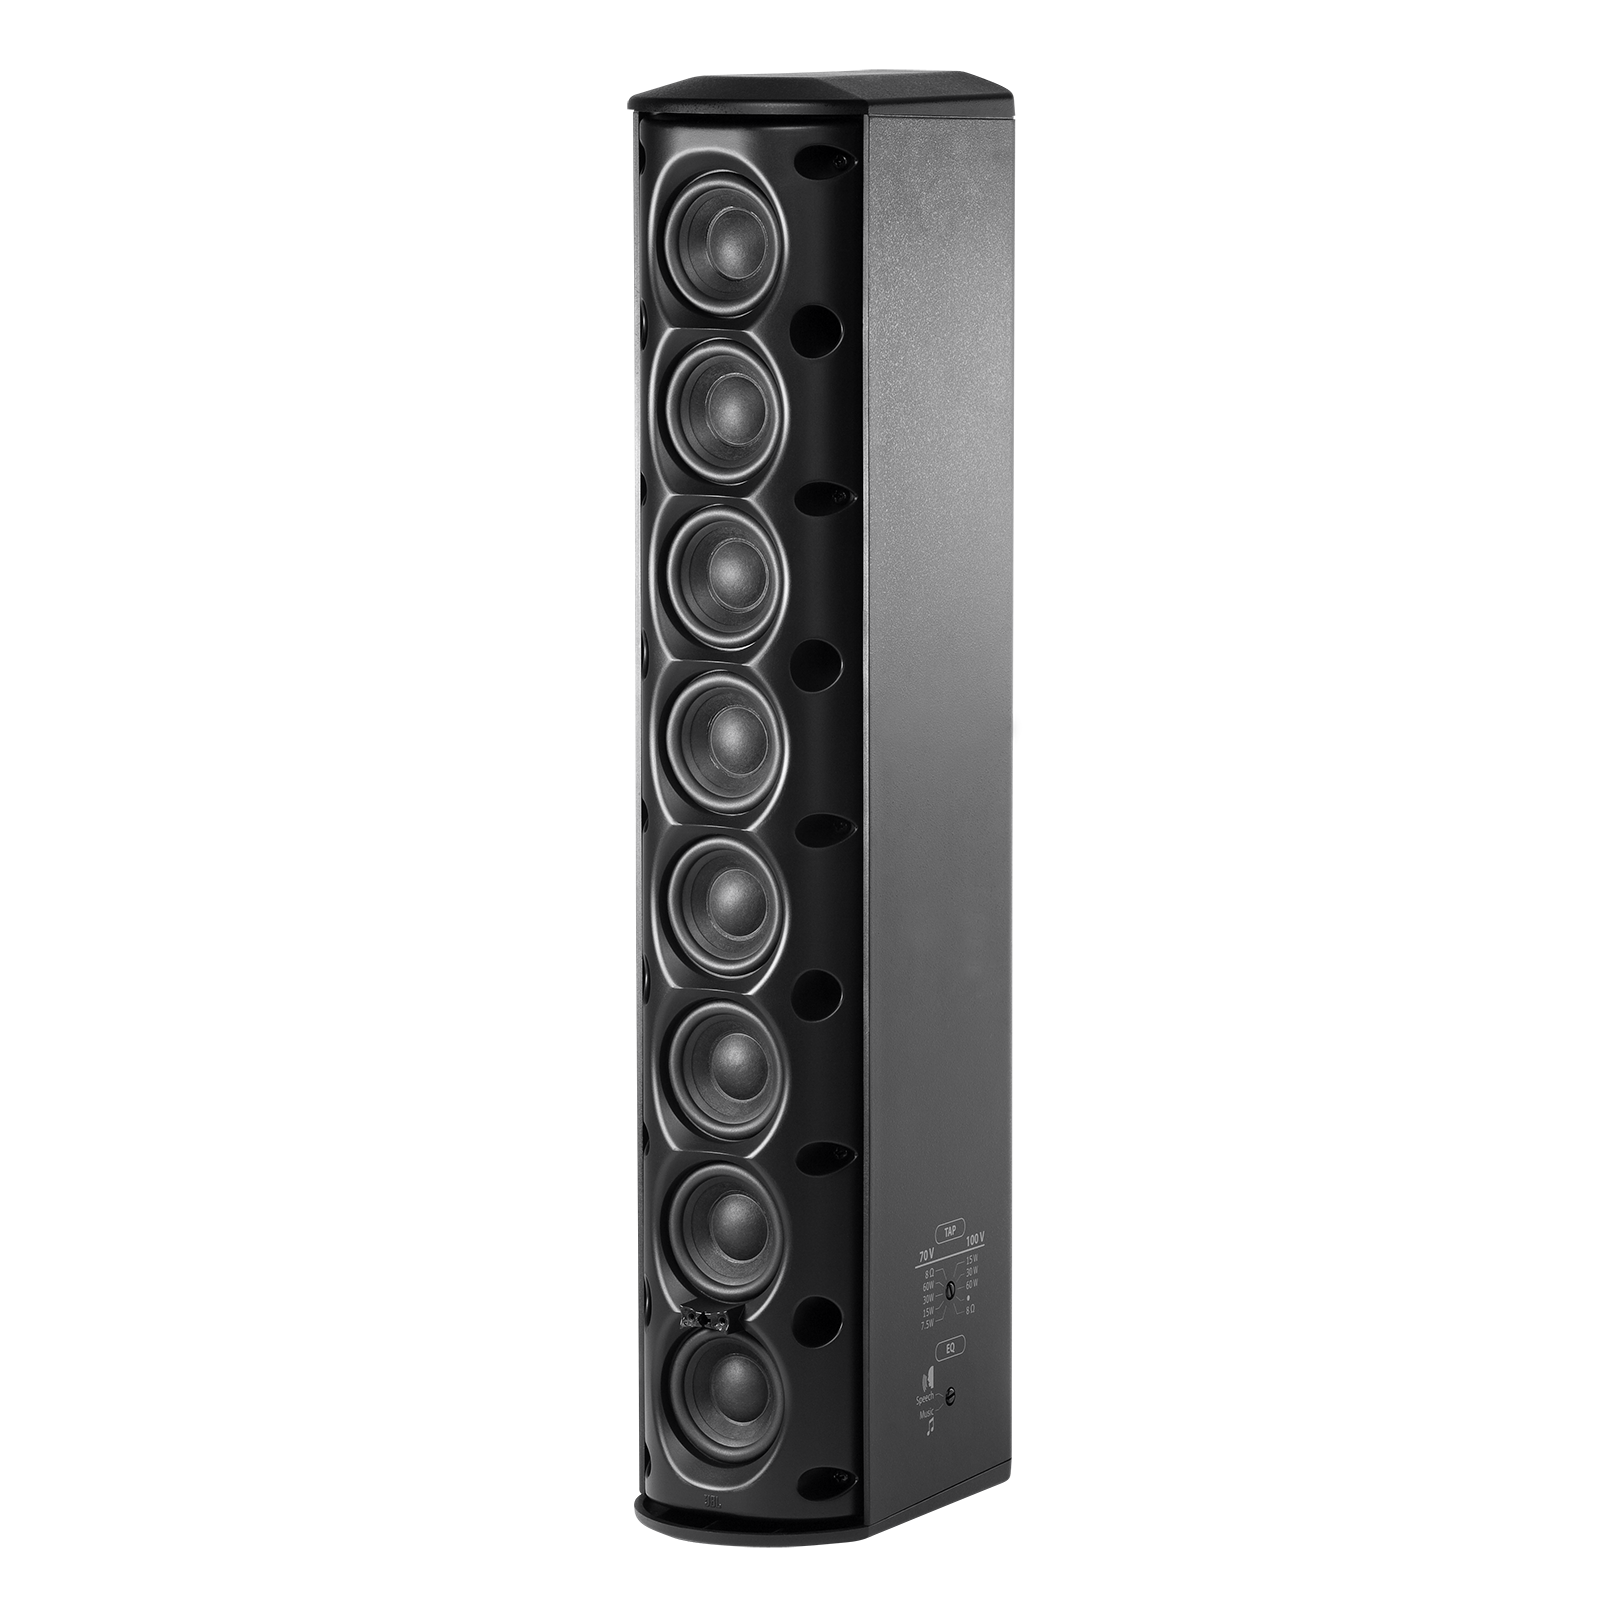 JBL CBT 50LA-1 - White - Constant Beamwidth Technology™ Line Array Column Loudspeaker - Detailshot 1